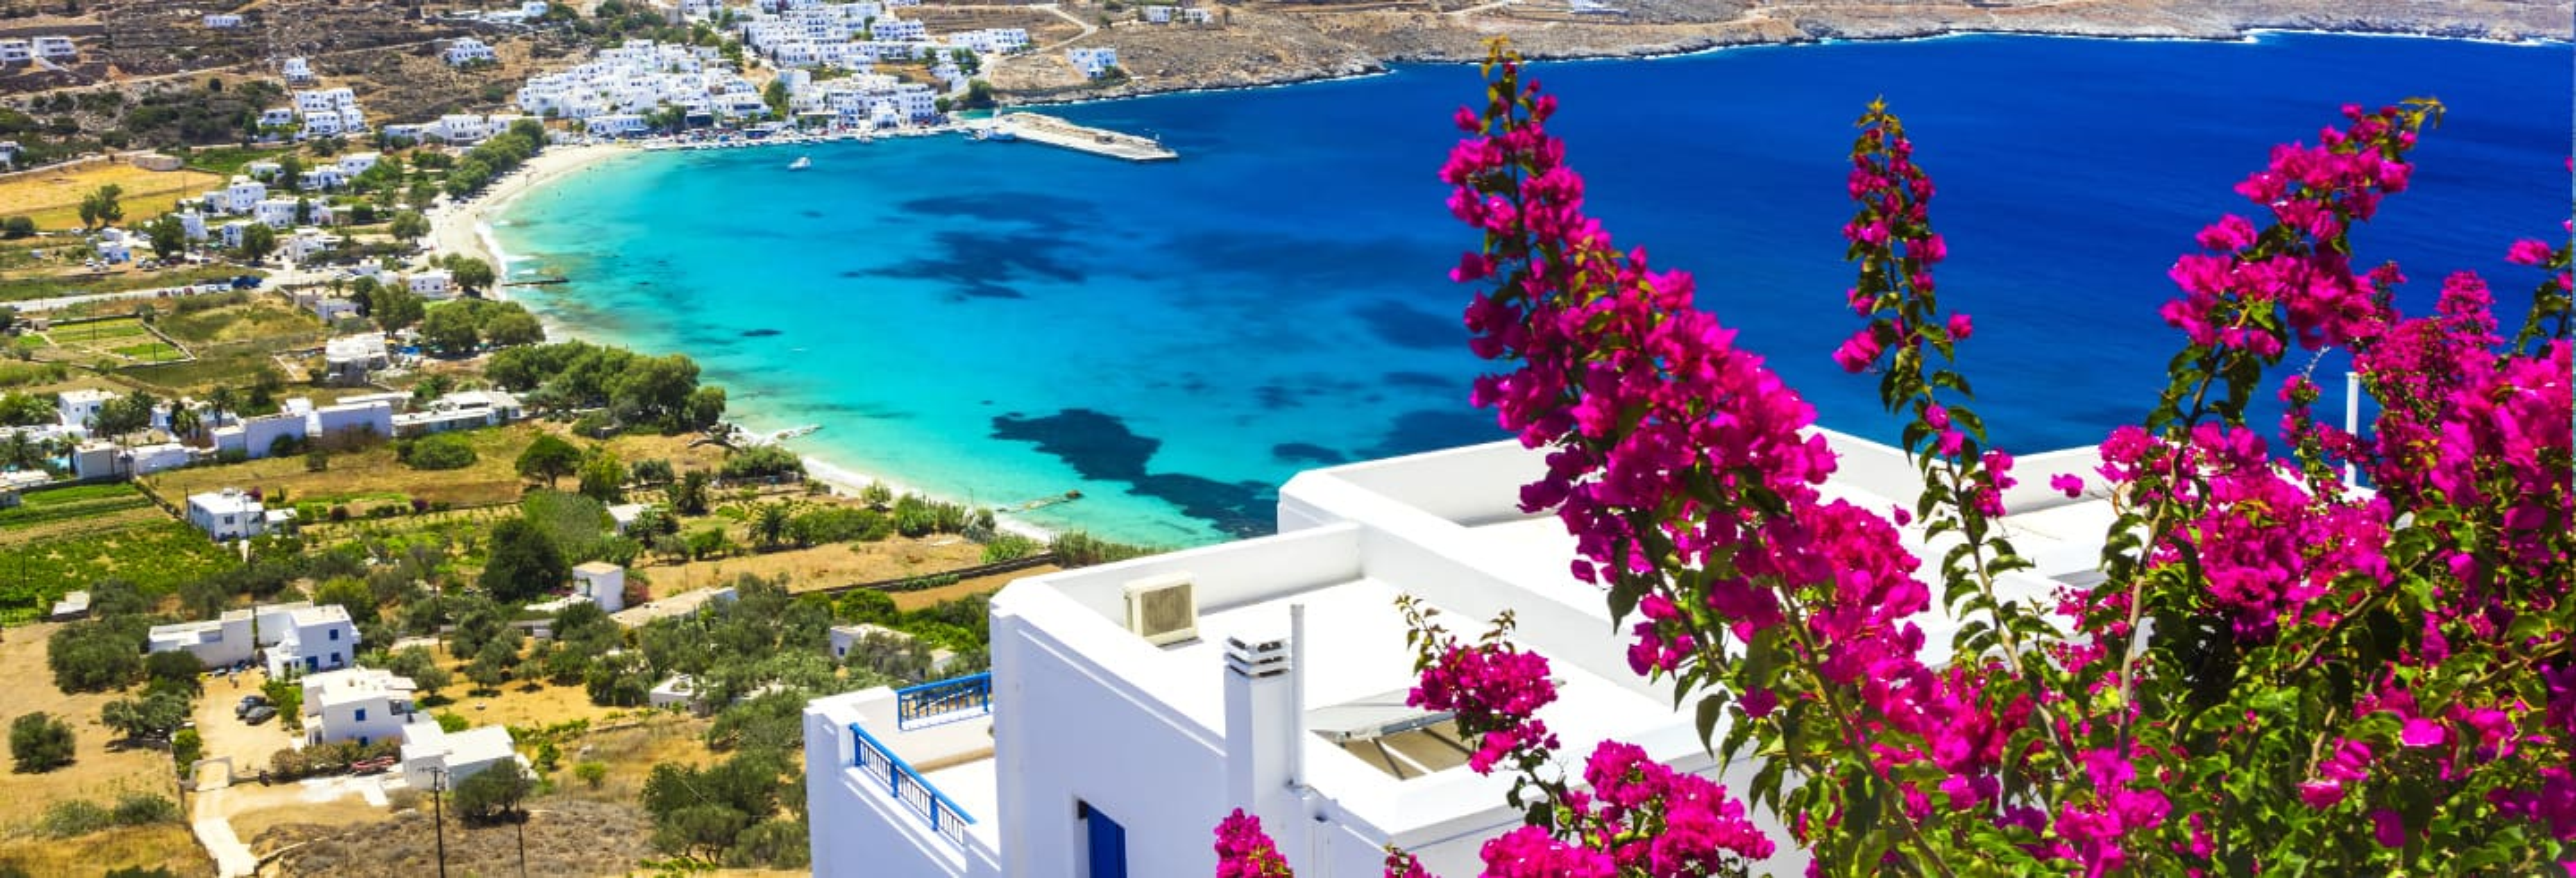 Boat Trip to Amorgos